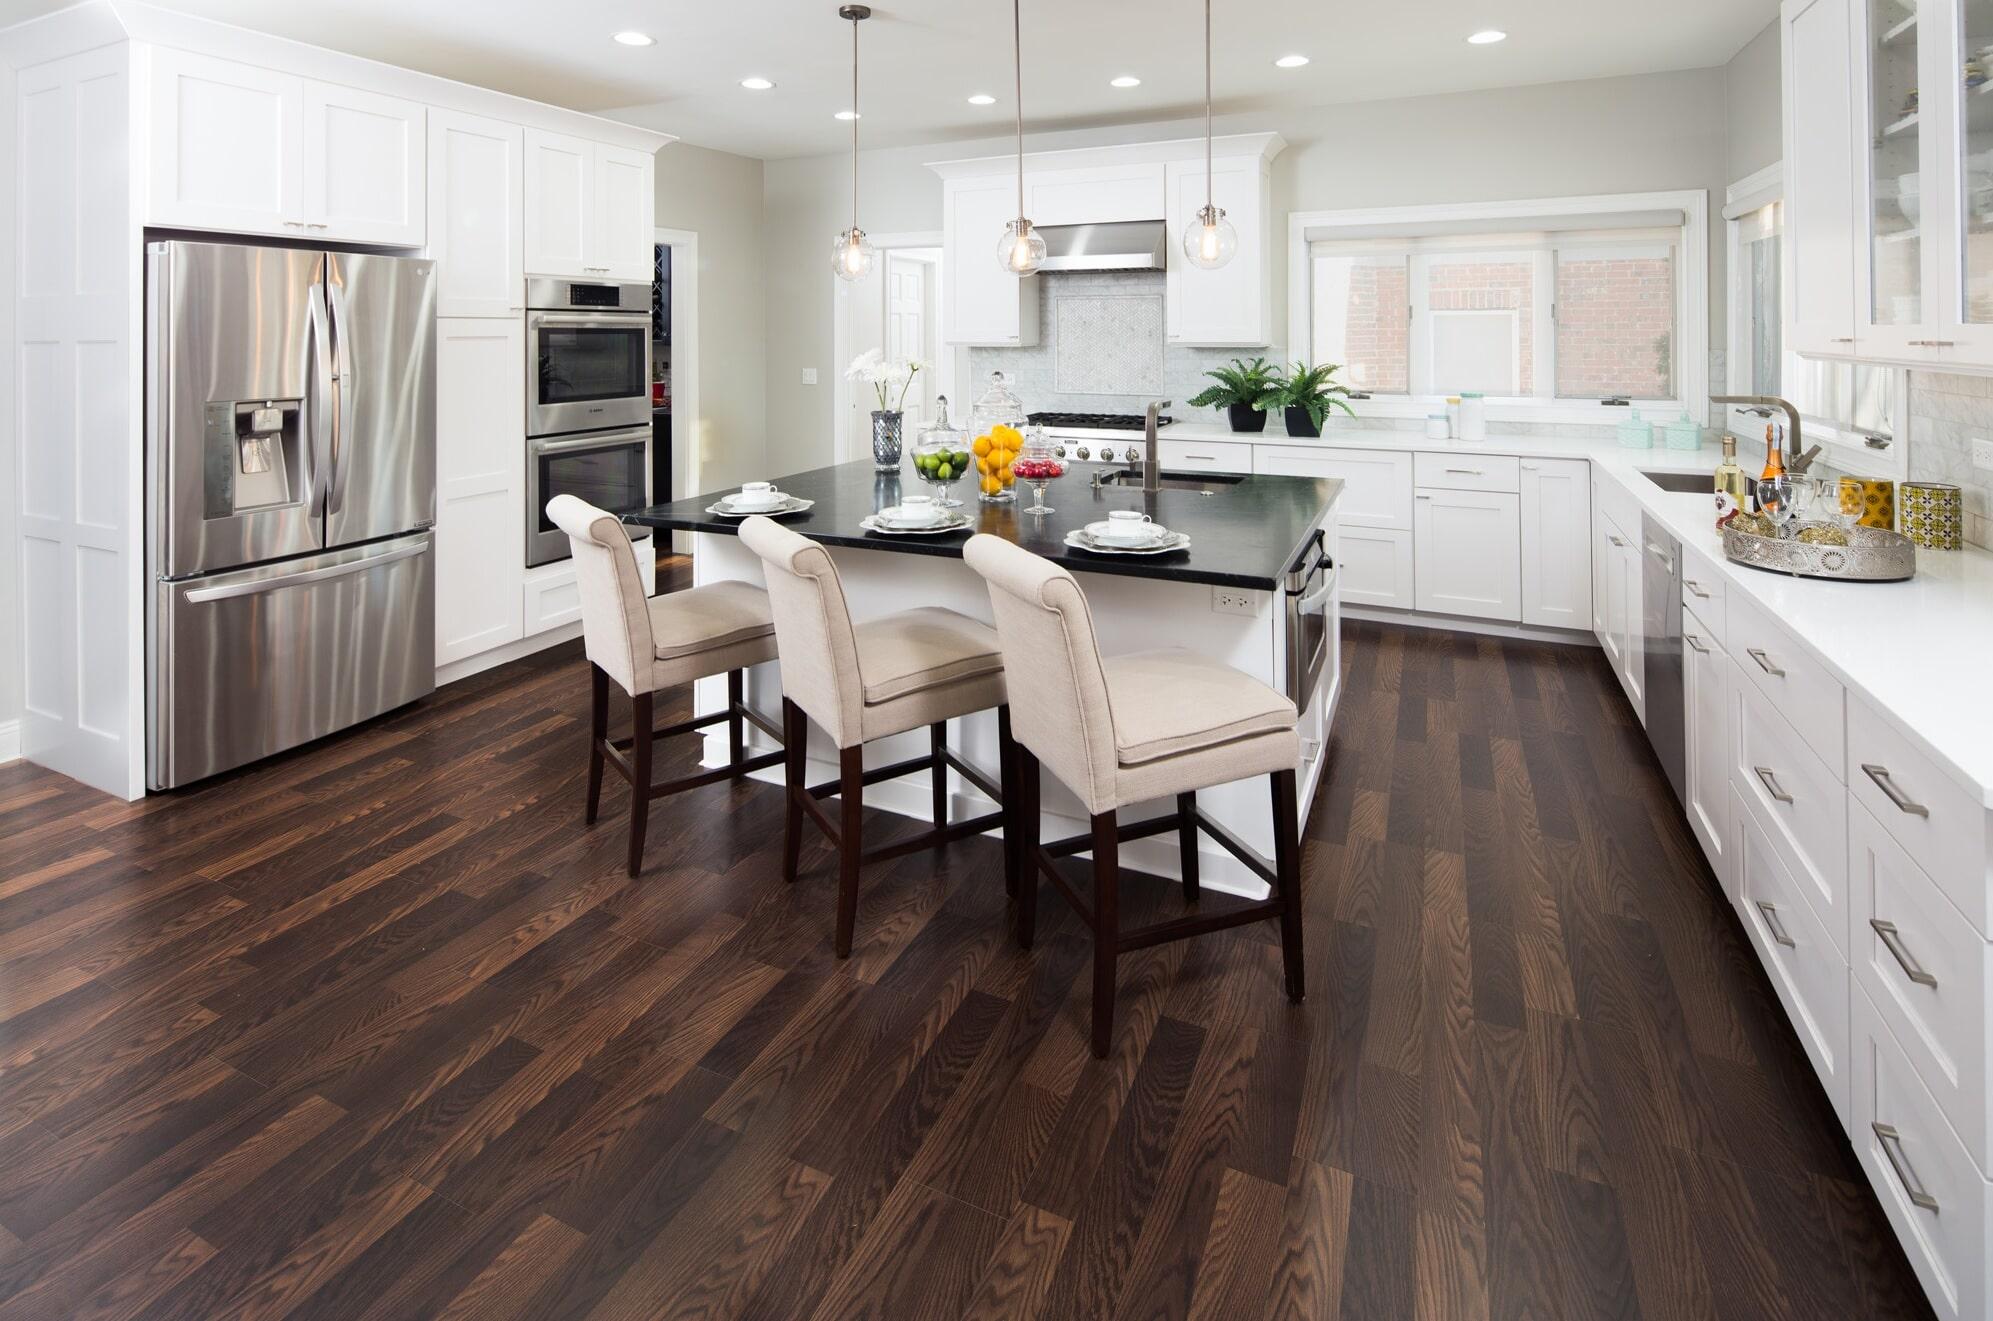 Cheap Laminate Flooring Dallas TX - Big Deal Flooring